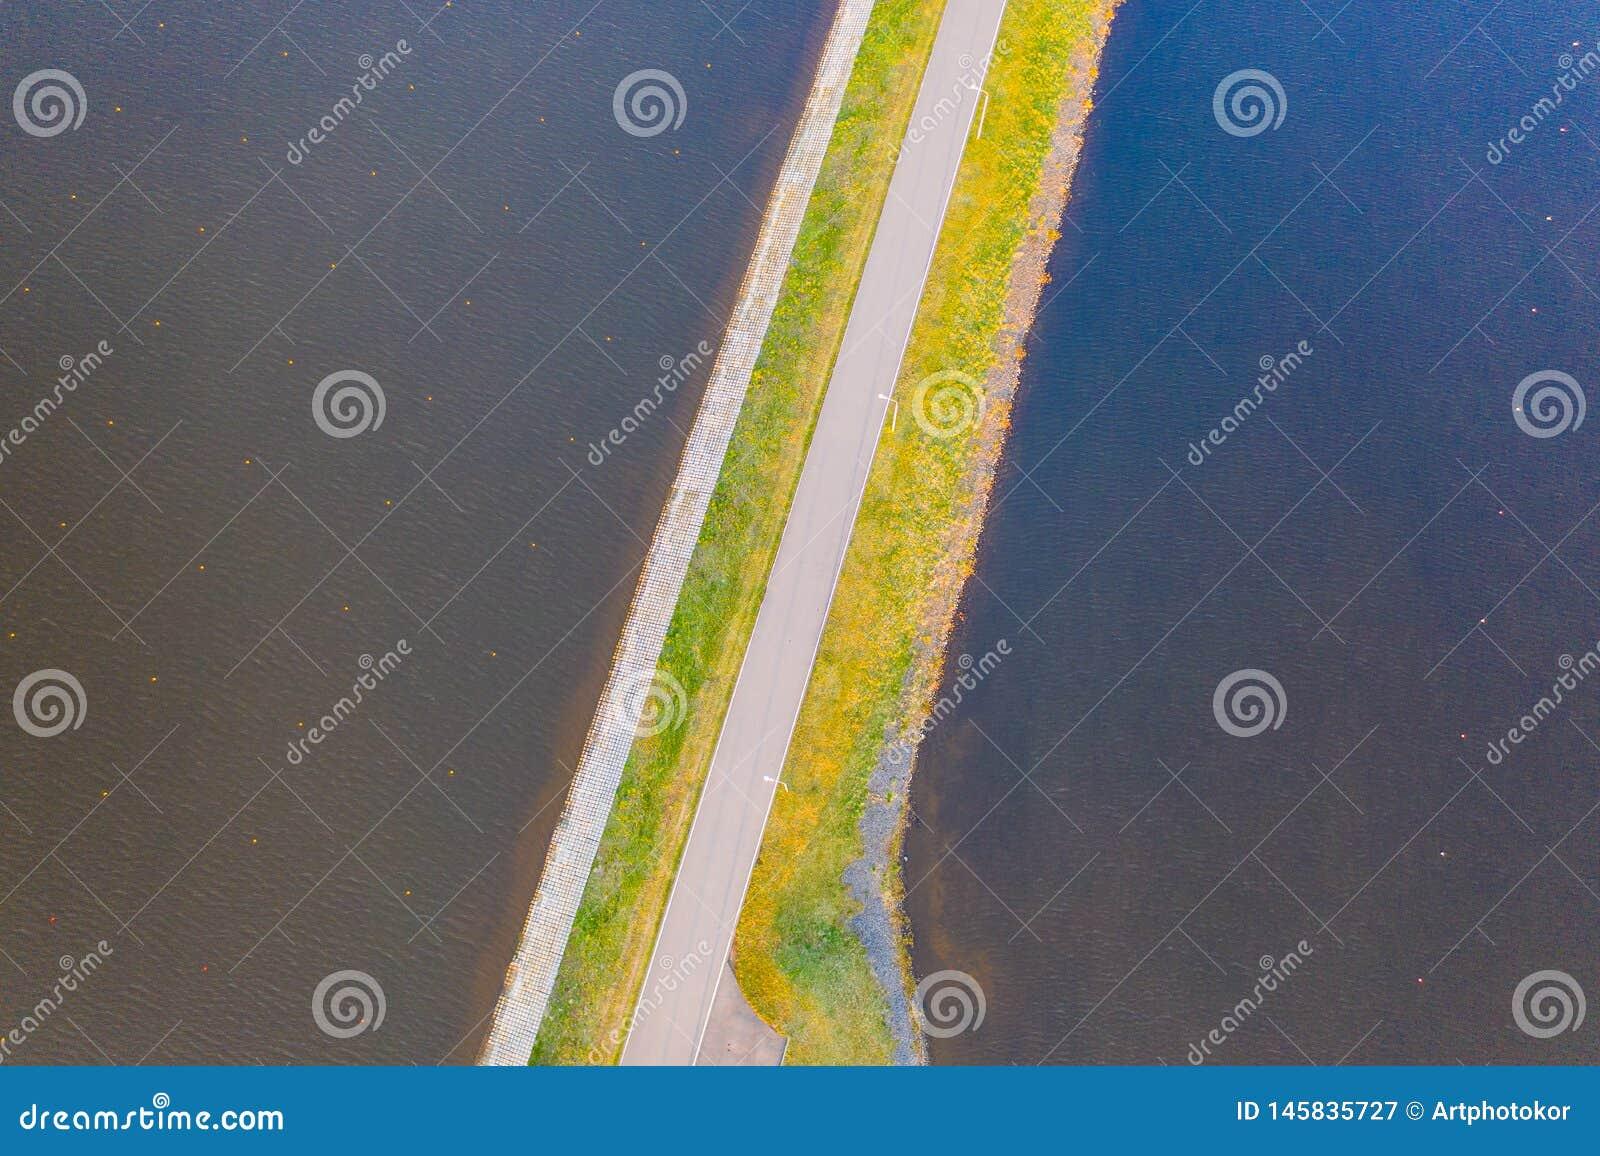 Rudern von Kanalvogelperspektive Radweg entlang Fluss